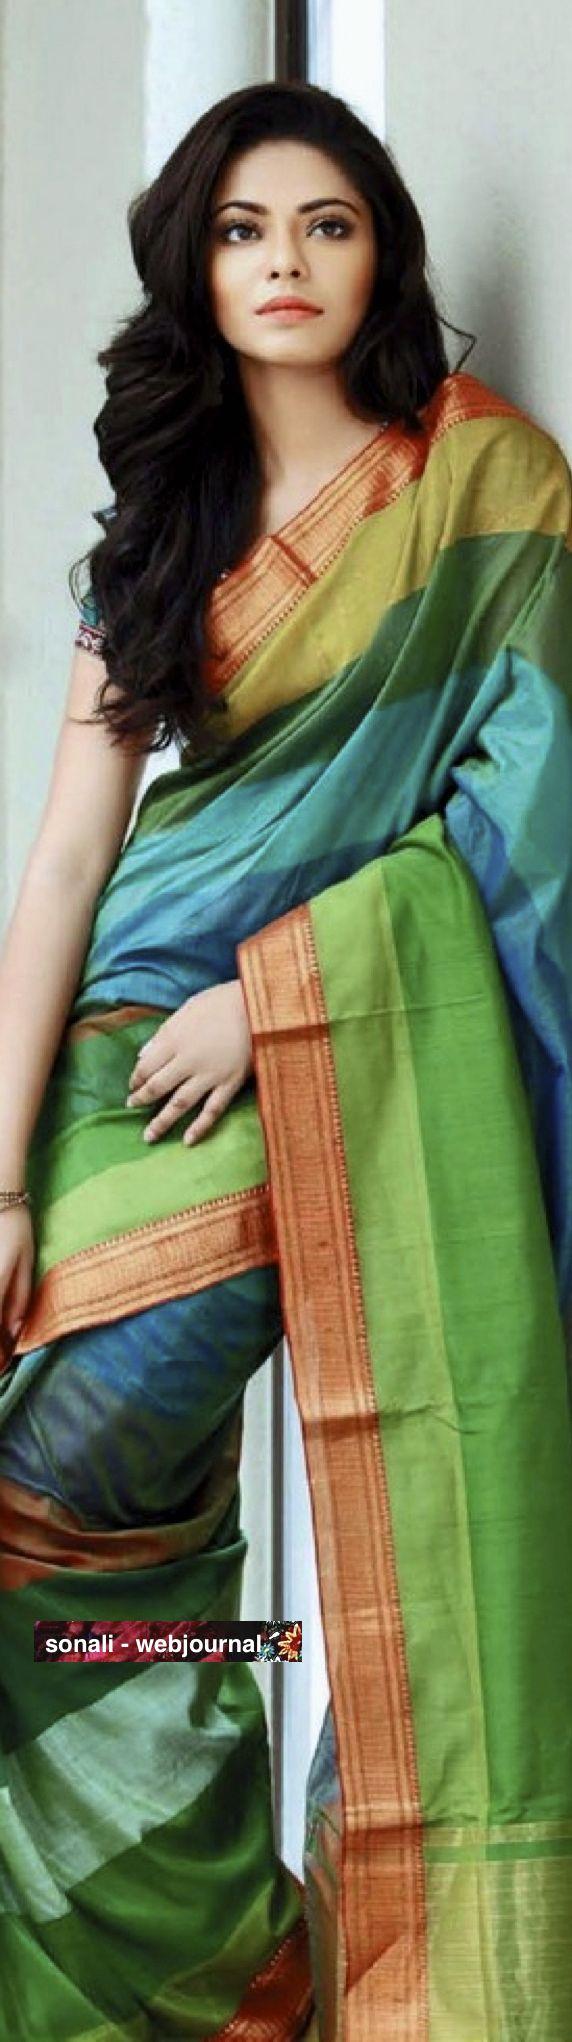 Silk cotton #Saree with #Handloom Mangalgiri border (w/ zari)